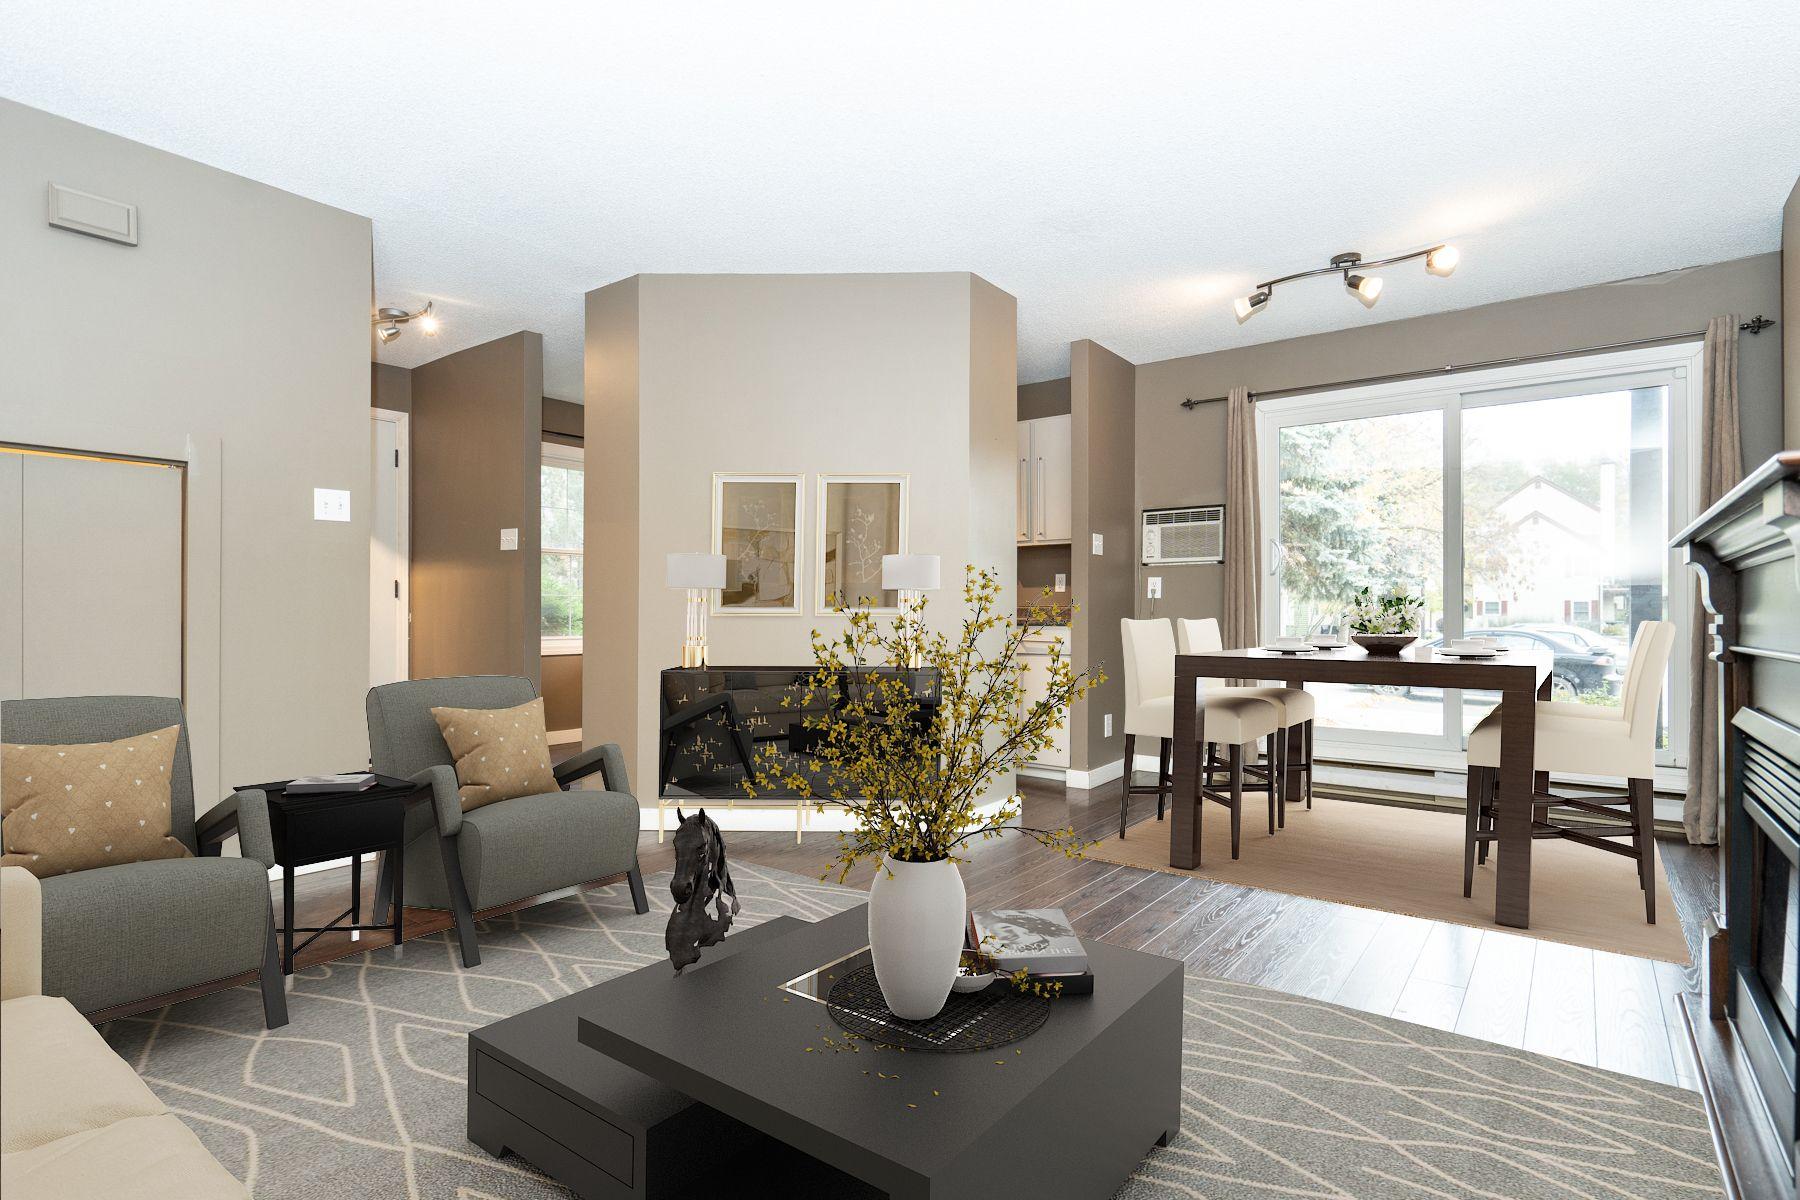 Main Photo: 4 610 Kenaston Boulevard in Winnipeg: River Heights South House for sale (1D)  : MLS®# 1827290